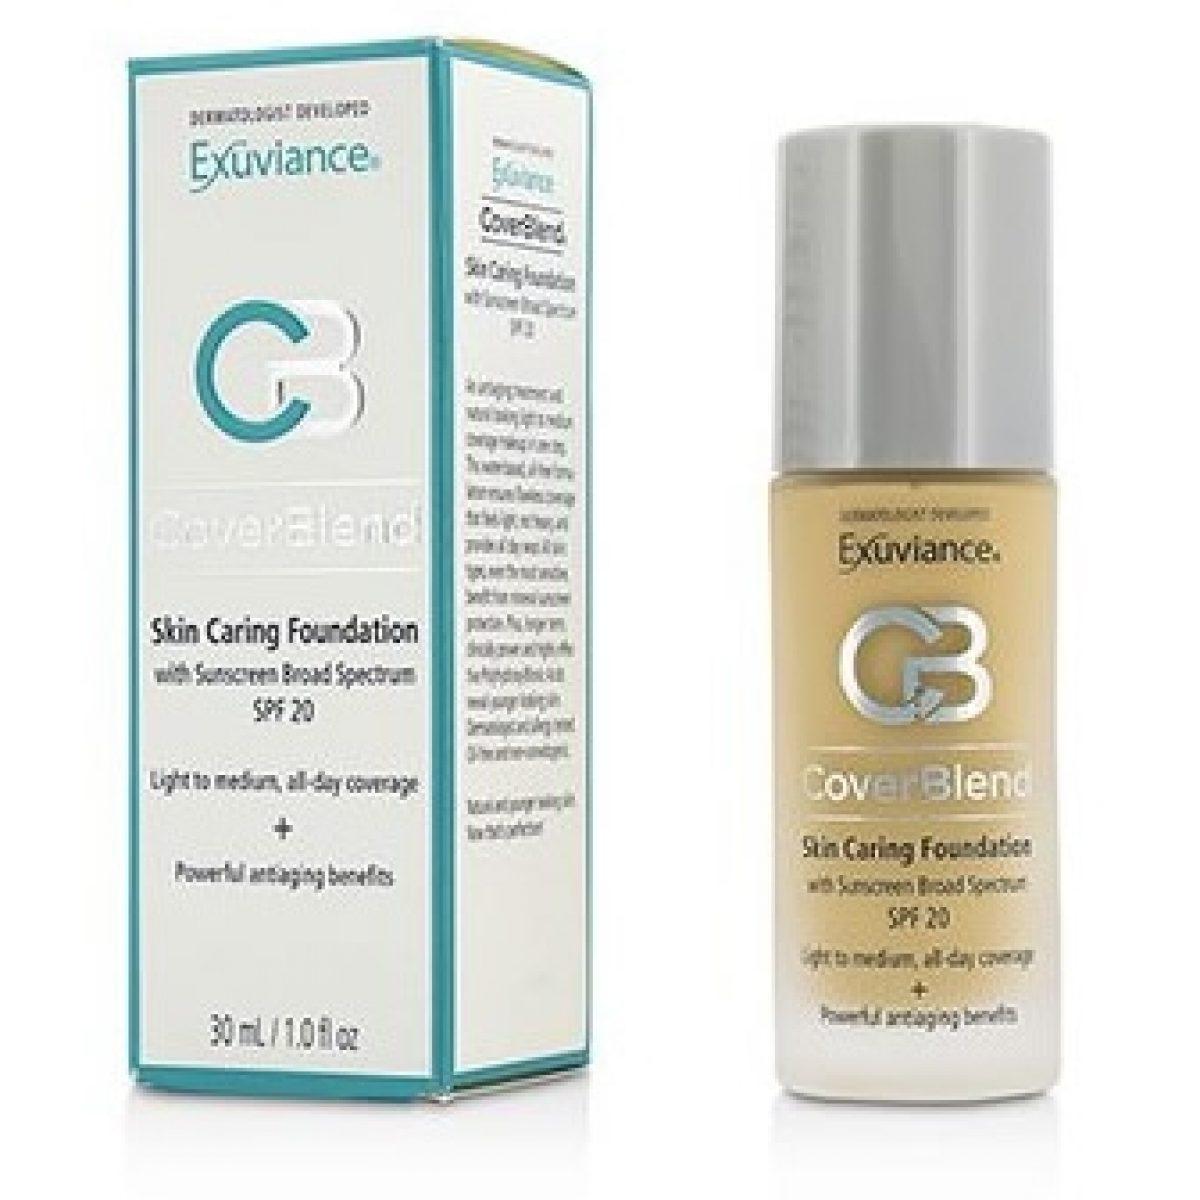 Skin Caring Foundation SPF 20